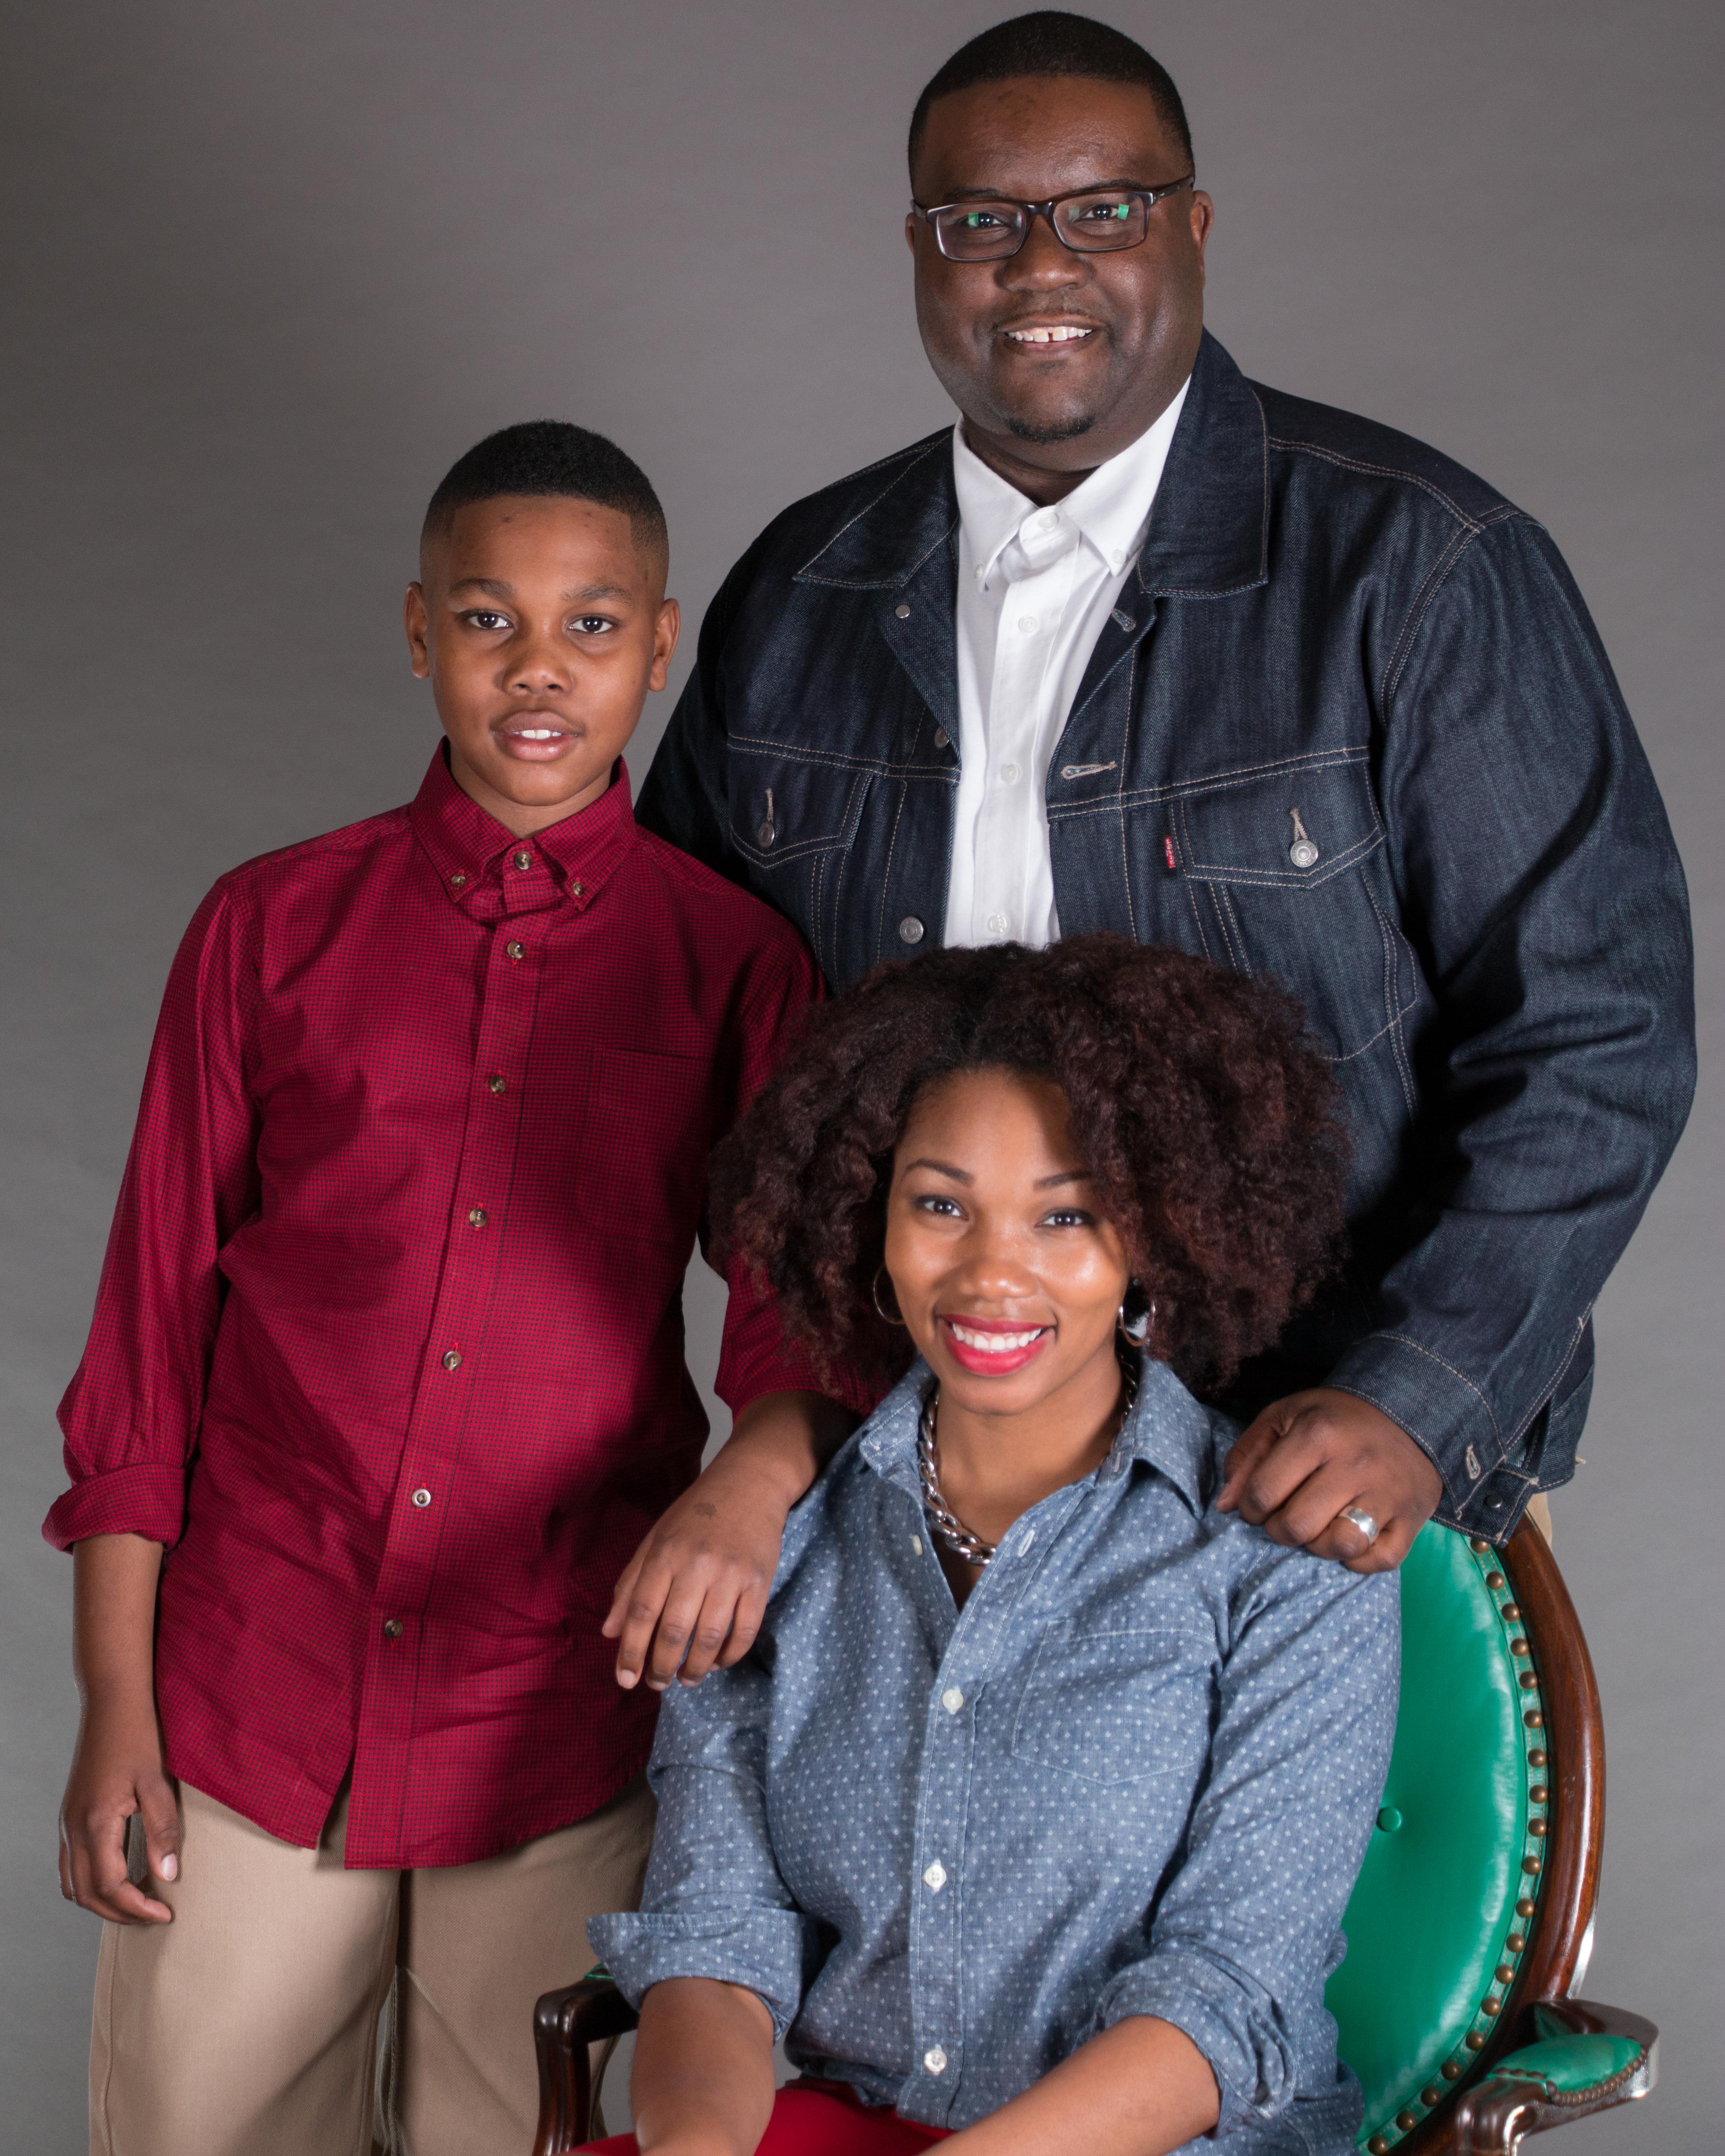 cj family 2-8.jpg